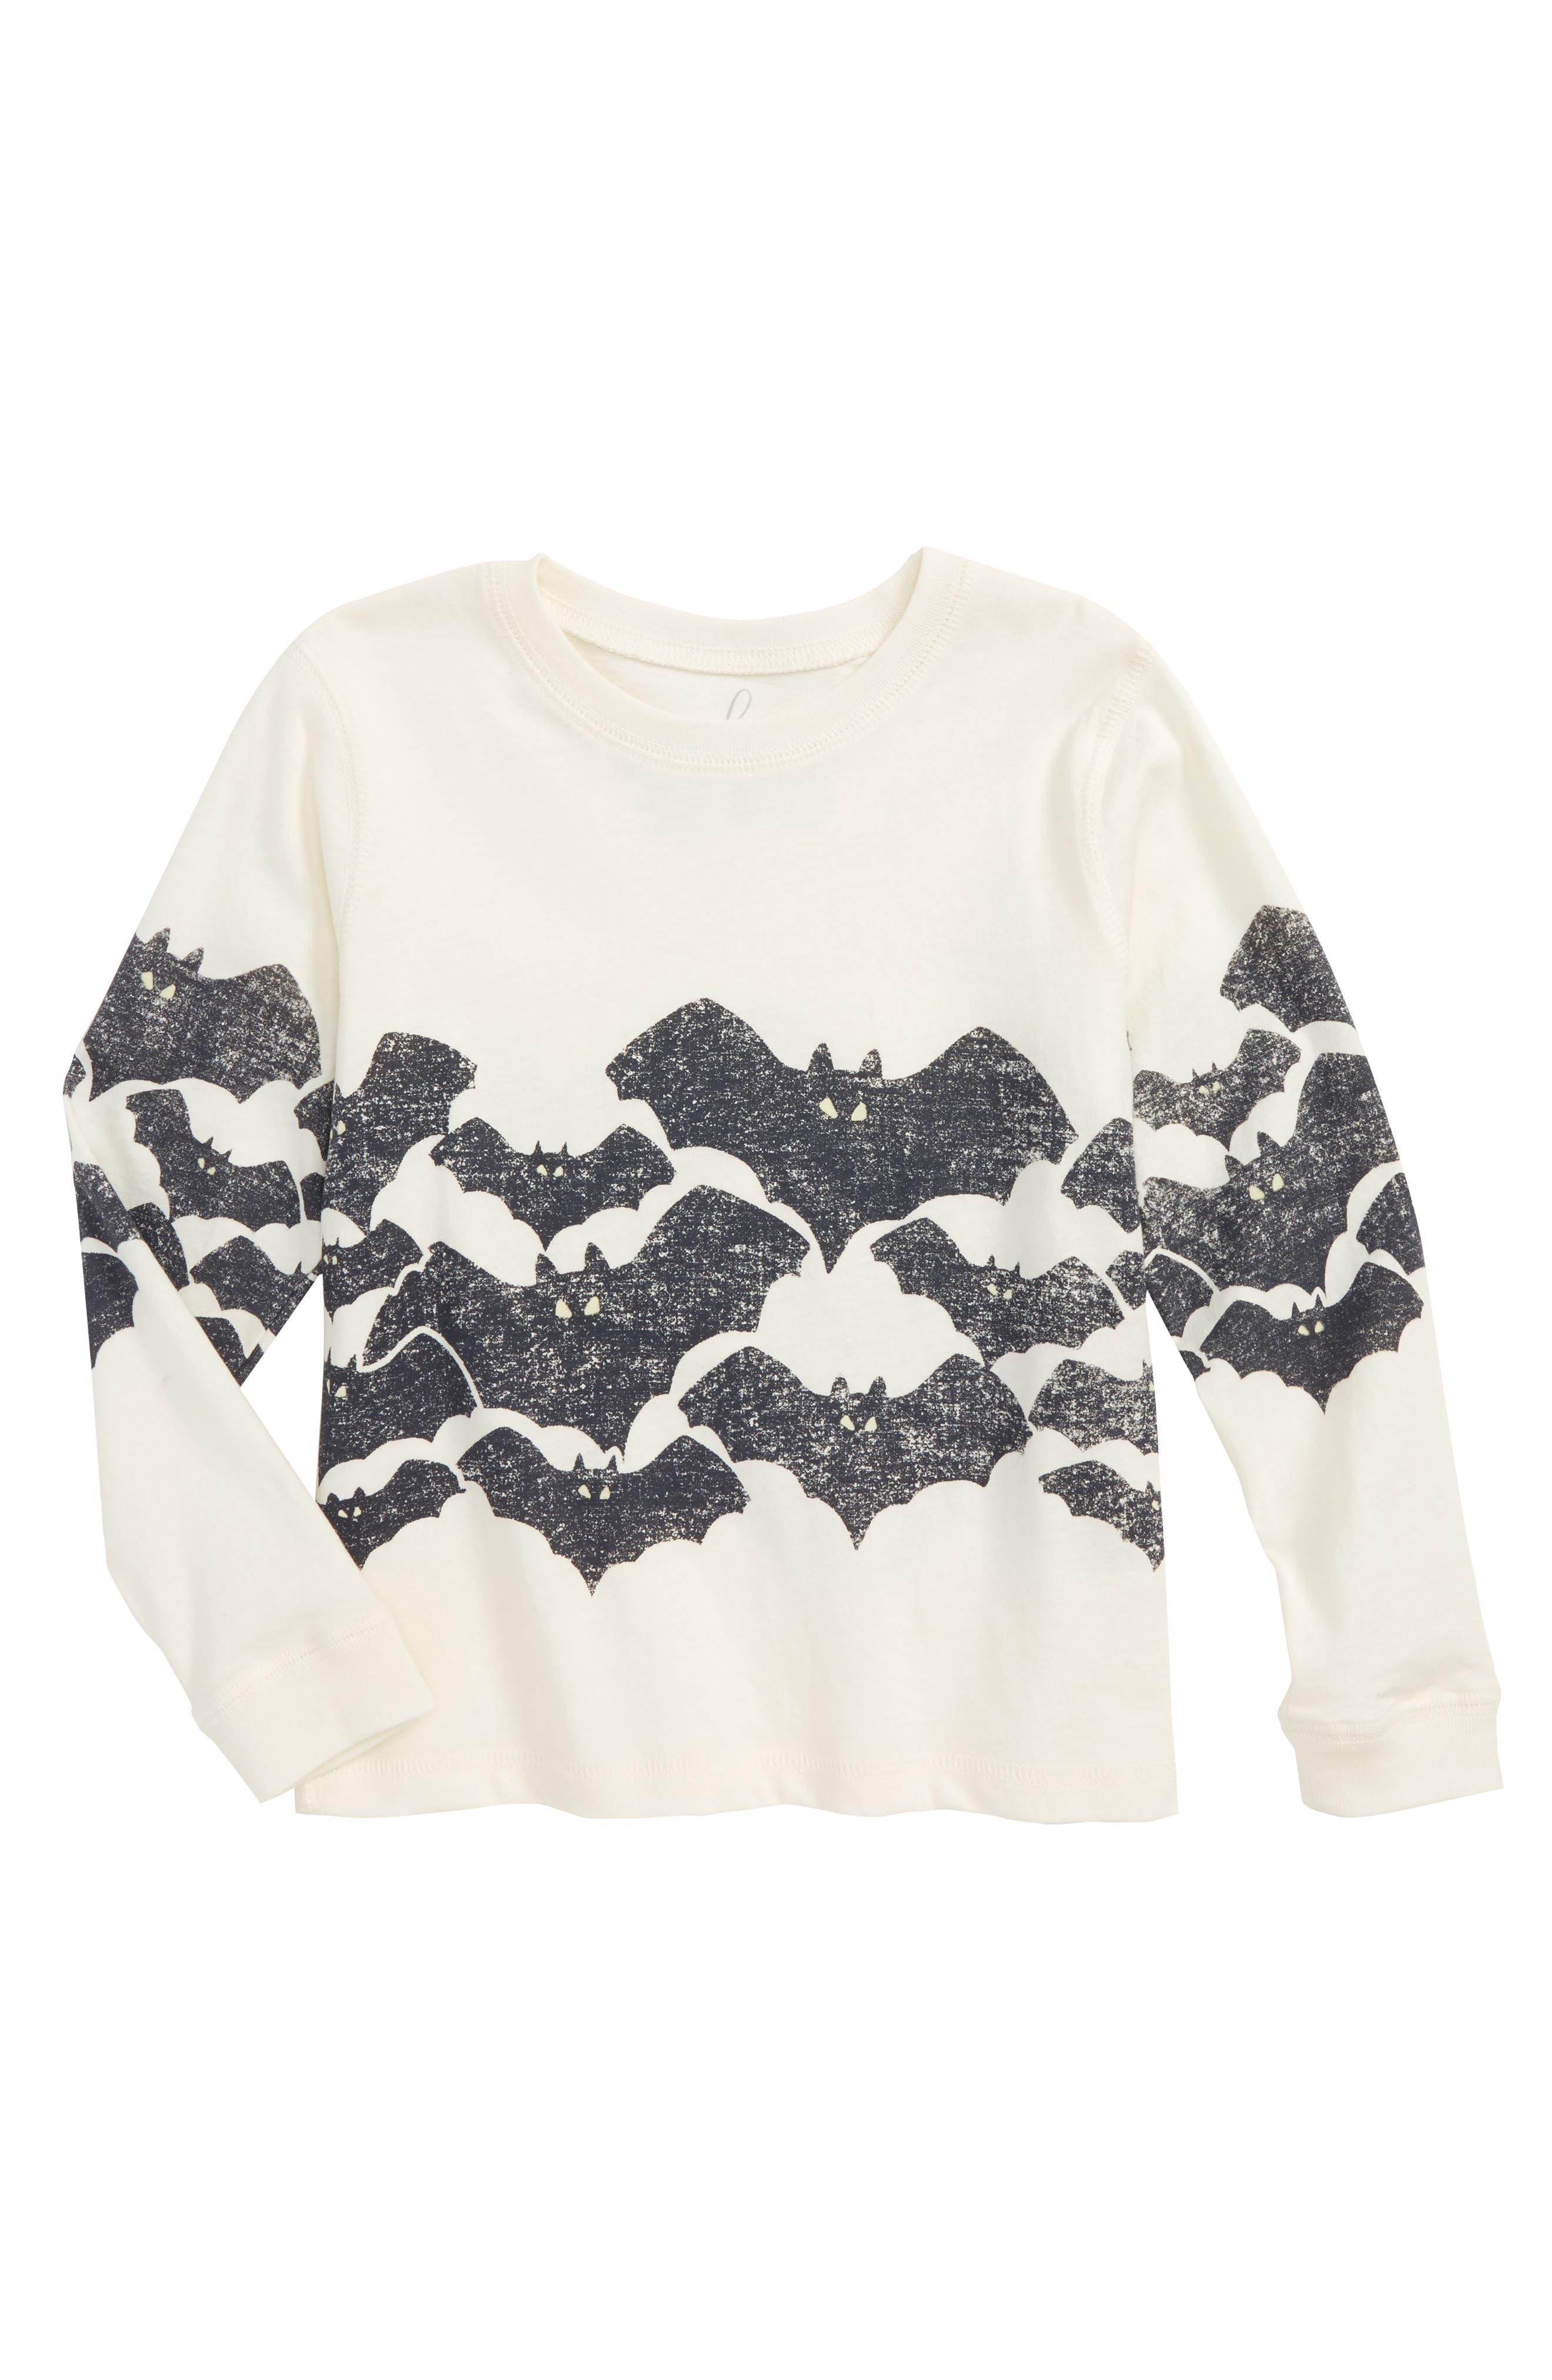 Main Image - Peek Bats Glow in the Dark T-Shirt (Toddler Boys, Little Boys & Big Boys)